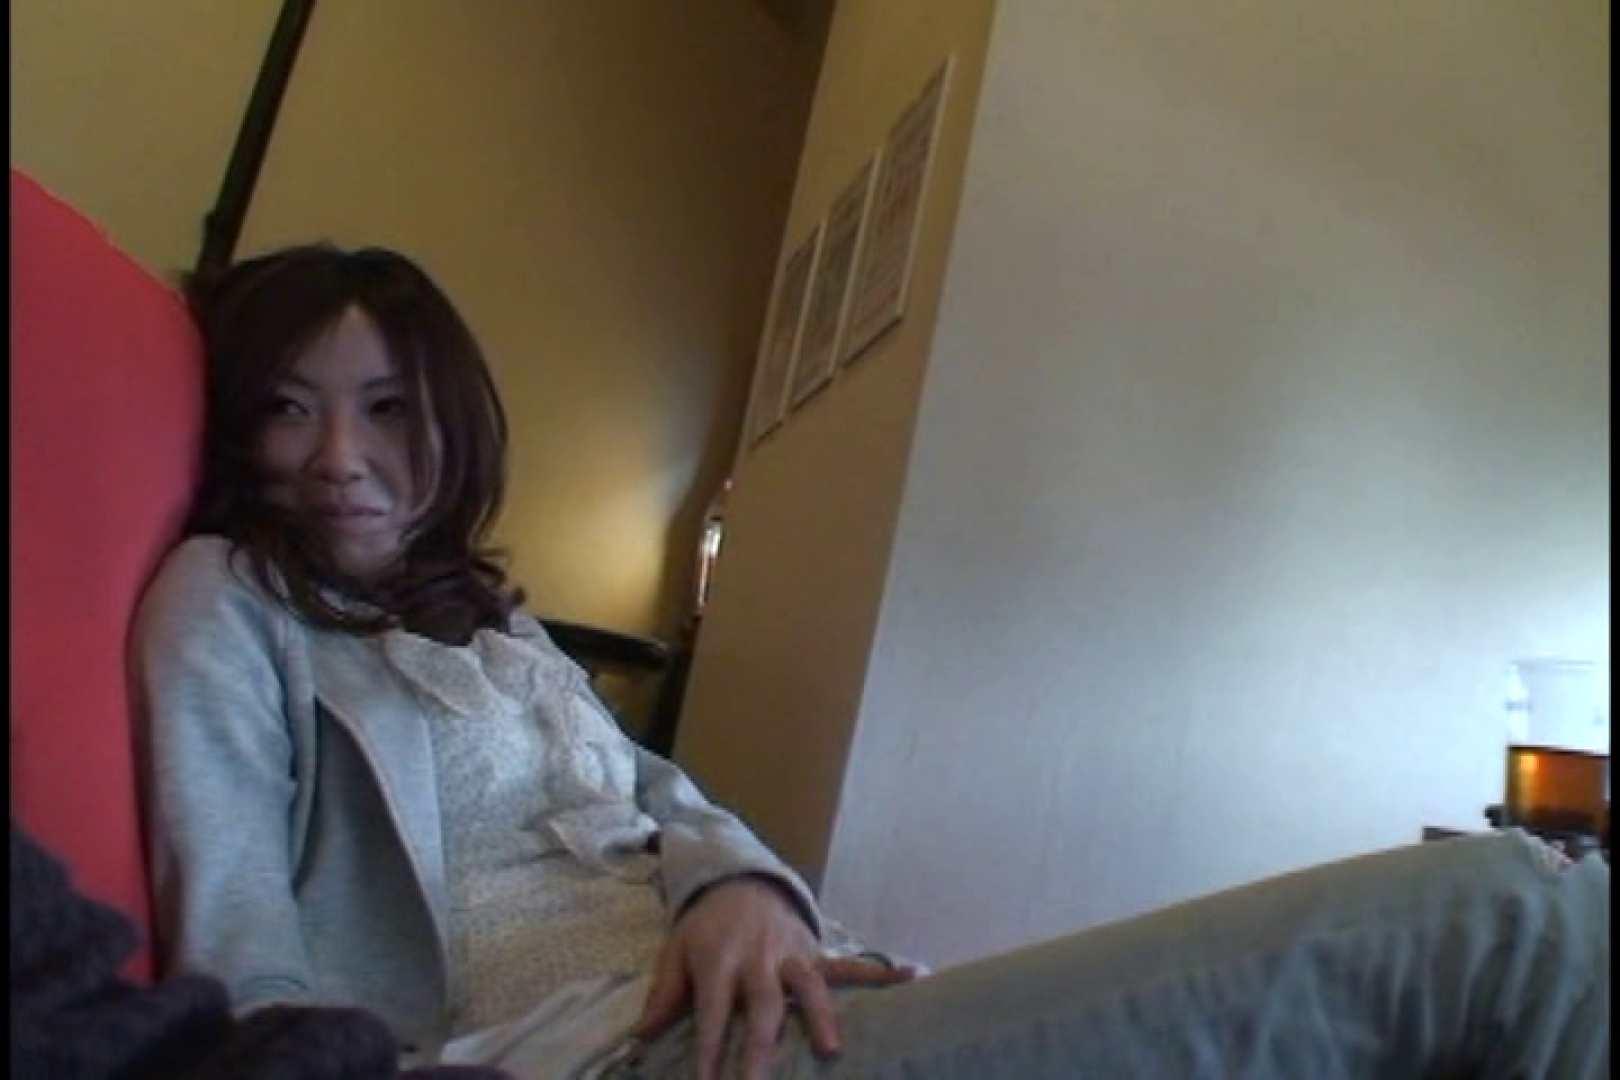 JDハンター全国ツアー vol.041 前編 女子大生のエロ動画  85PIX 34